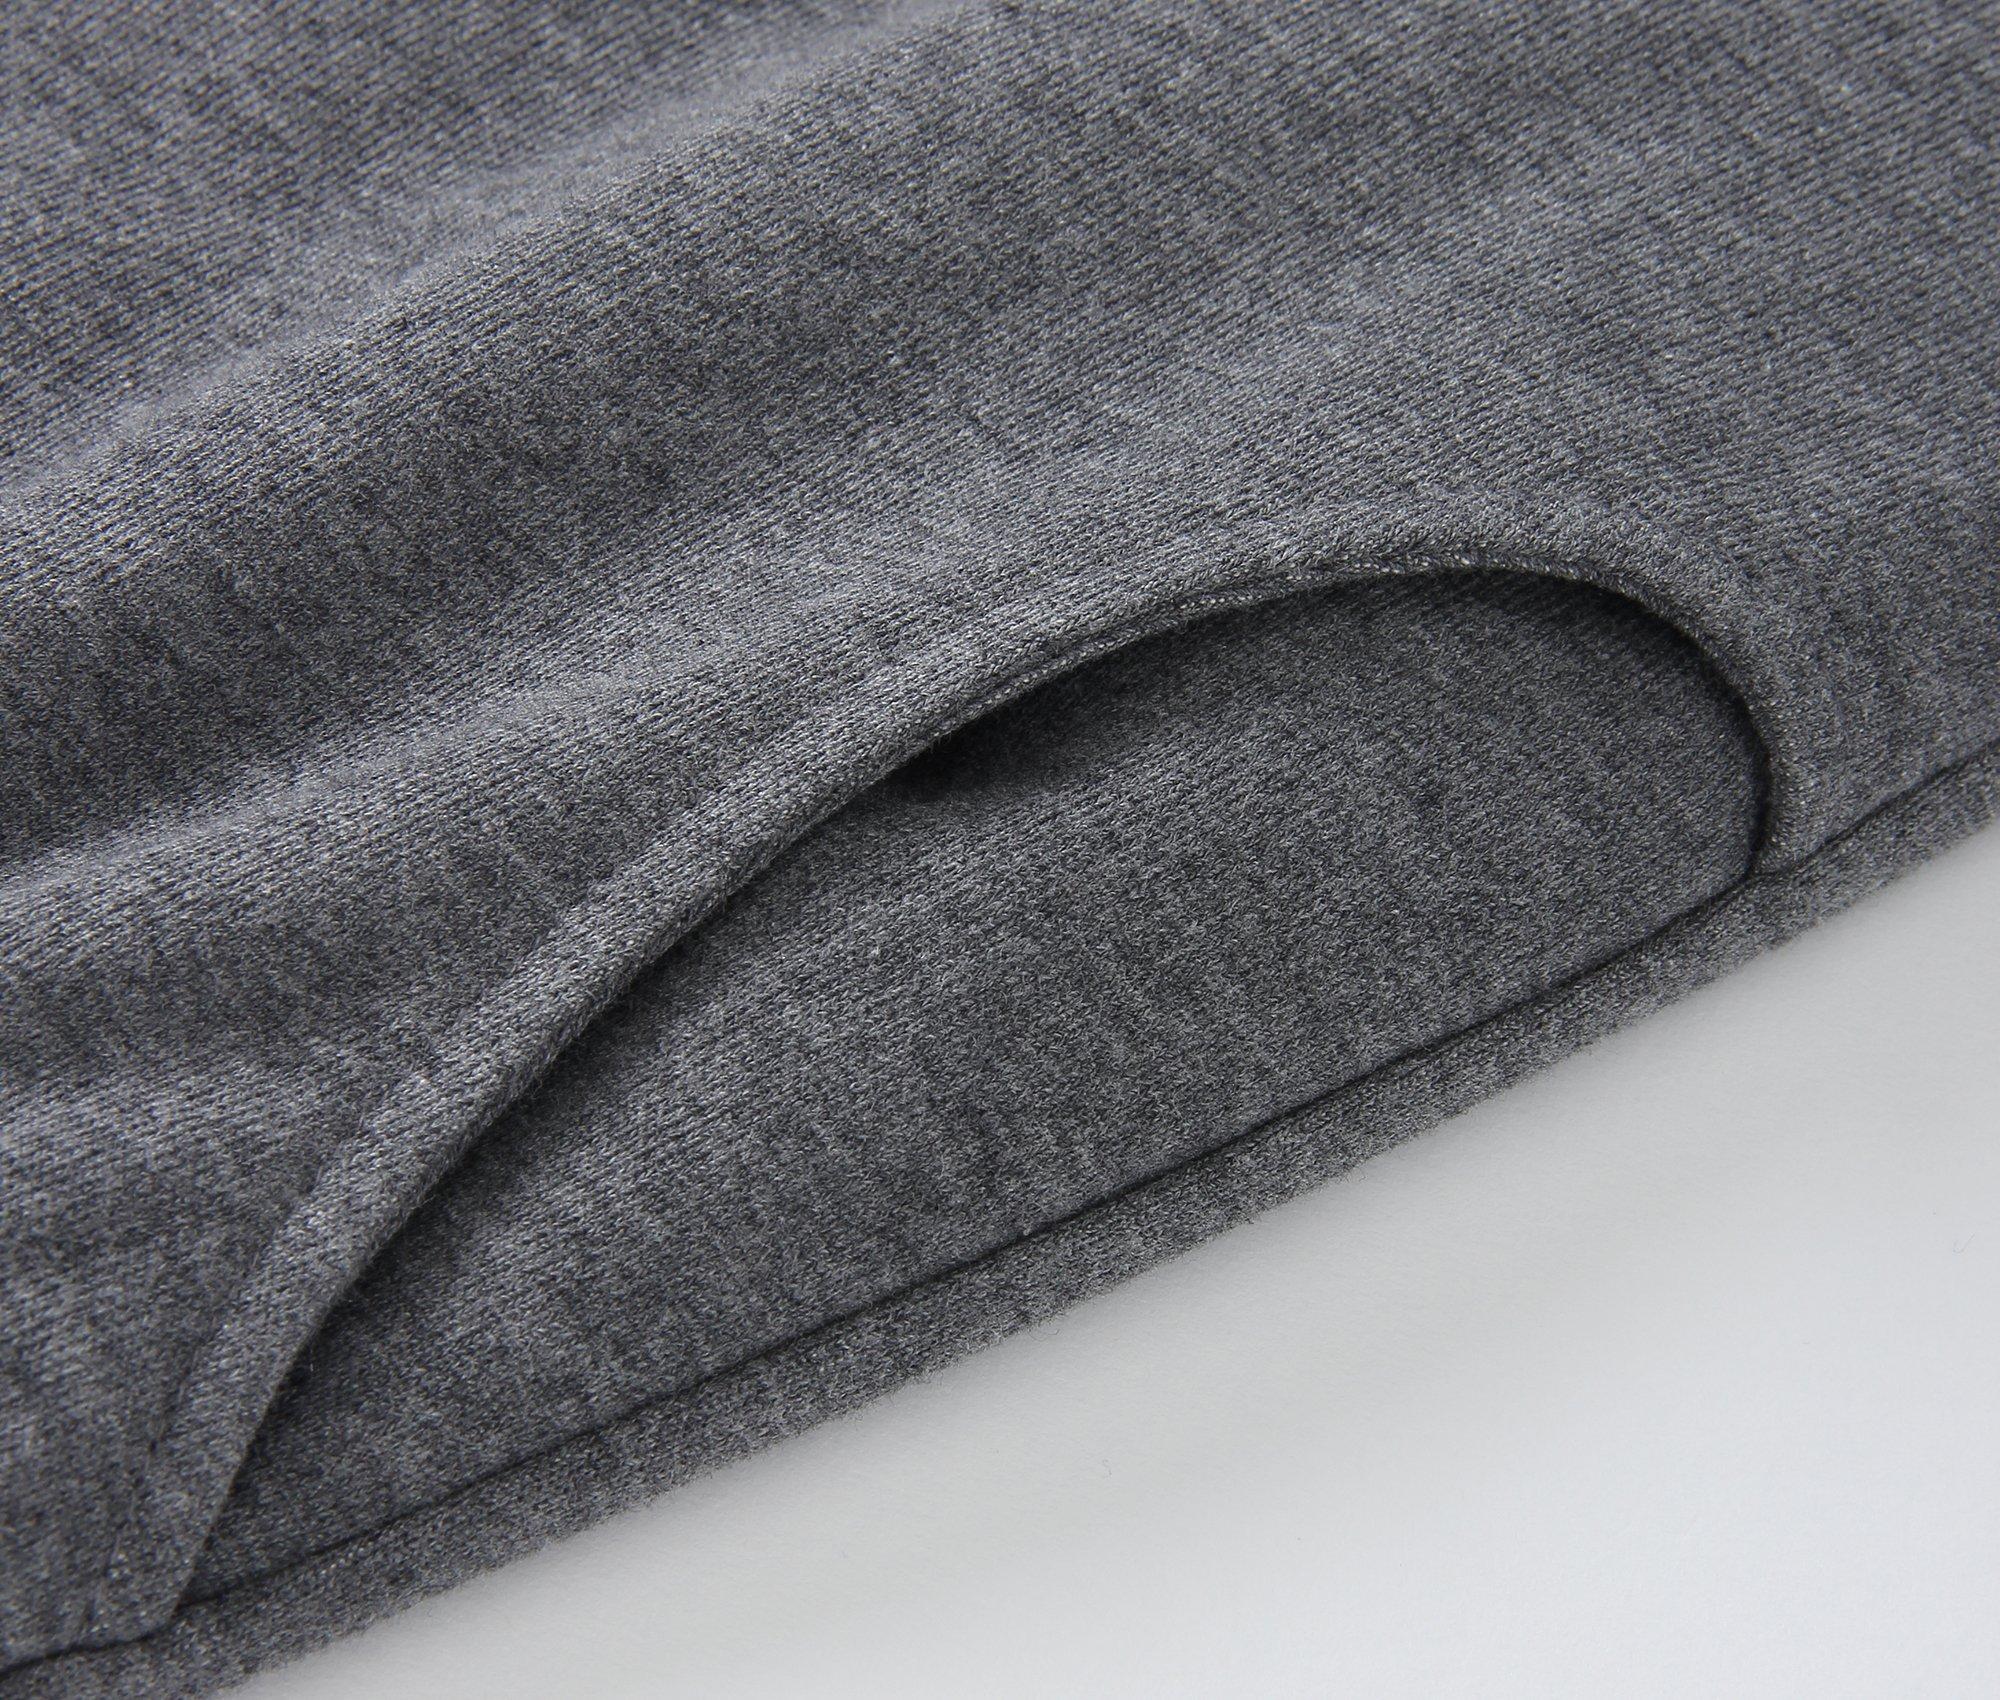 45e01b2bde Latuza Women s Cotton Stretchy Lounge Sweat Shorts M Gray2   Casual ...